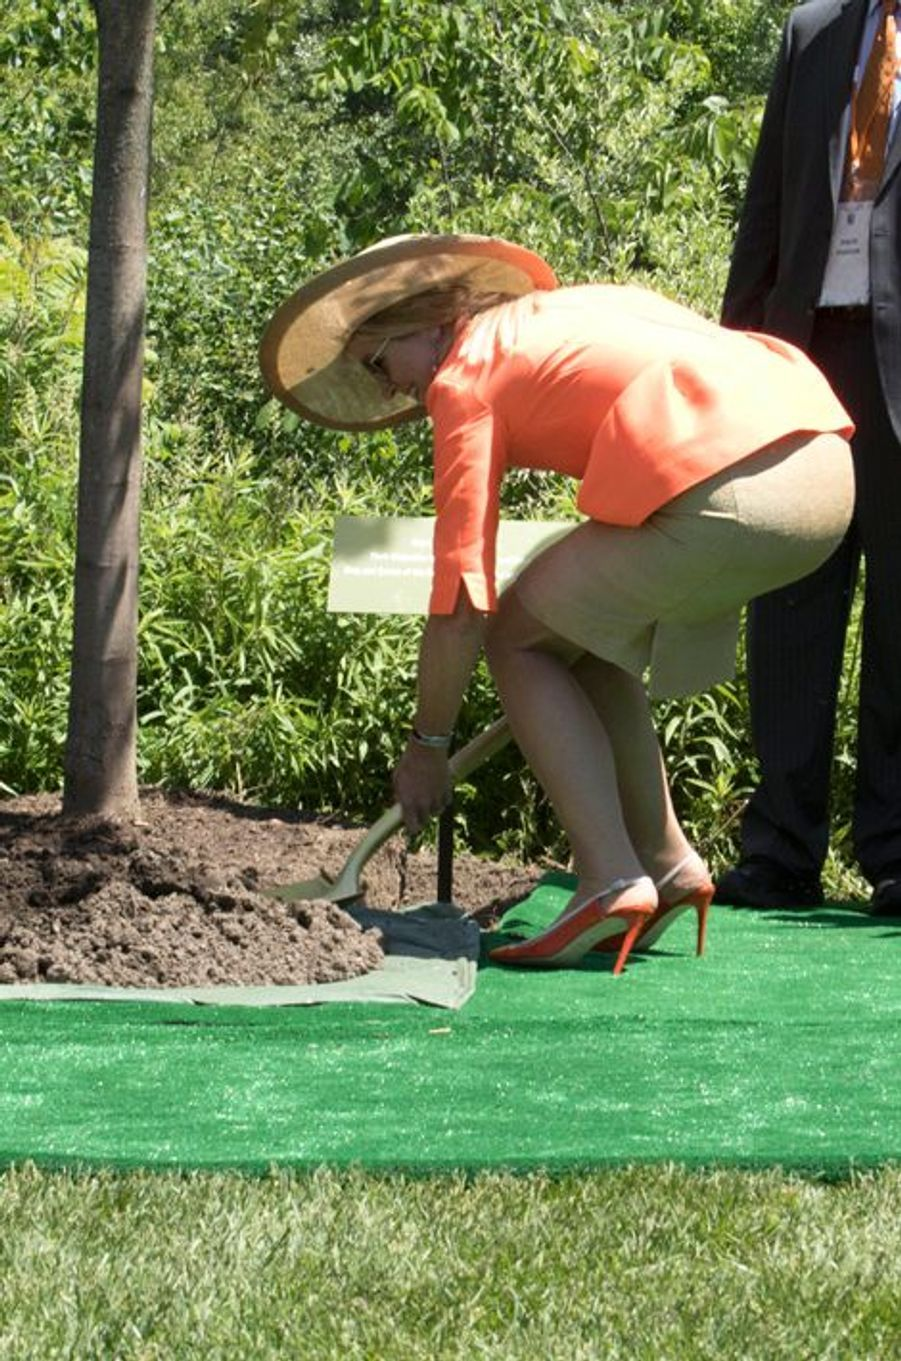 La reine Maxima au Frederik Meijer Gardens and Sculpture Park à Grand Rapids, le 2 juin 2015